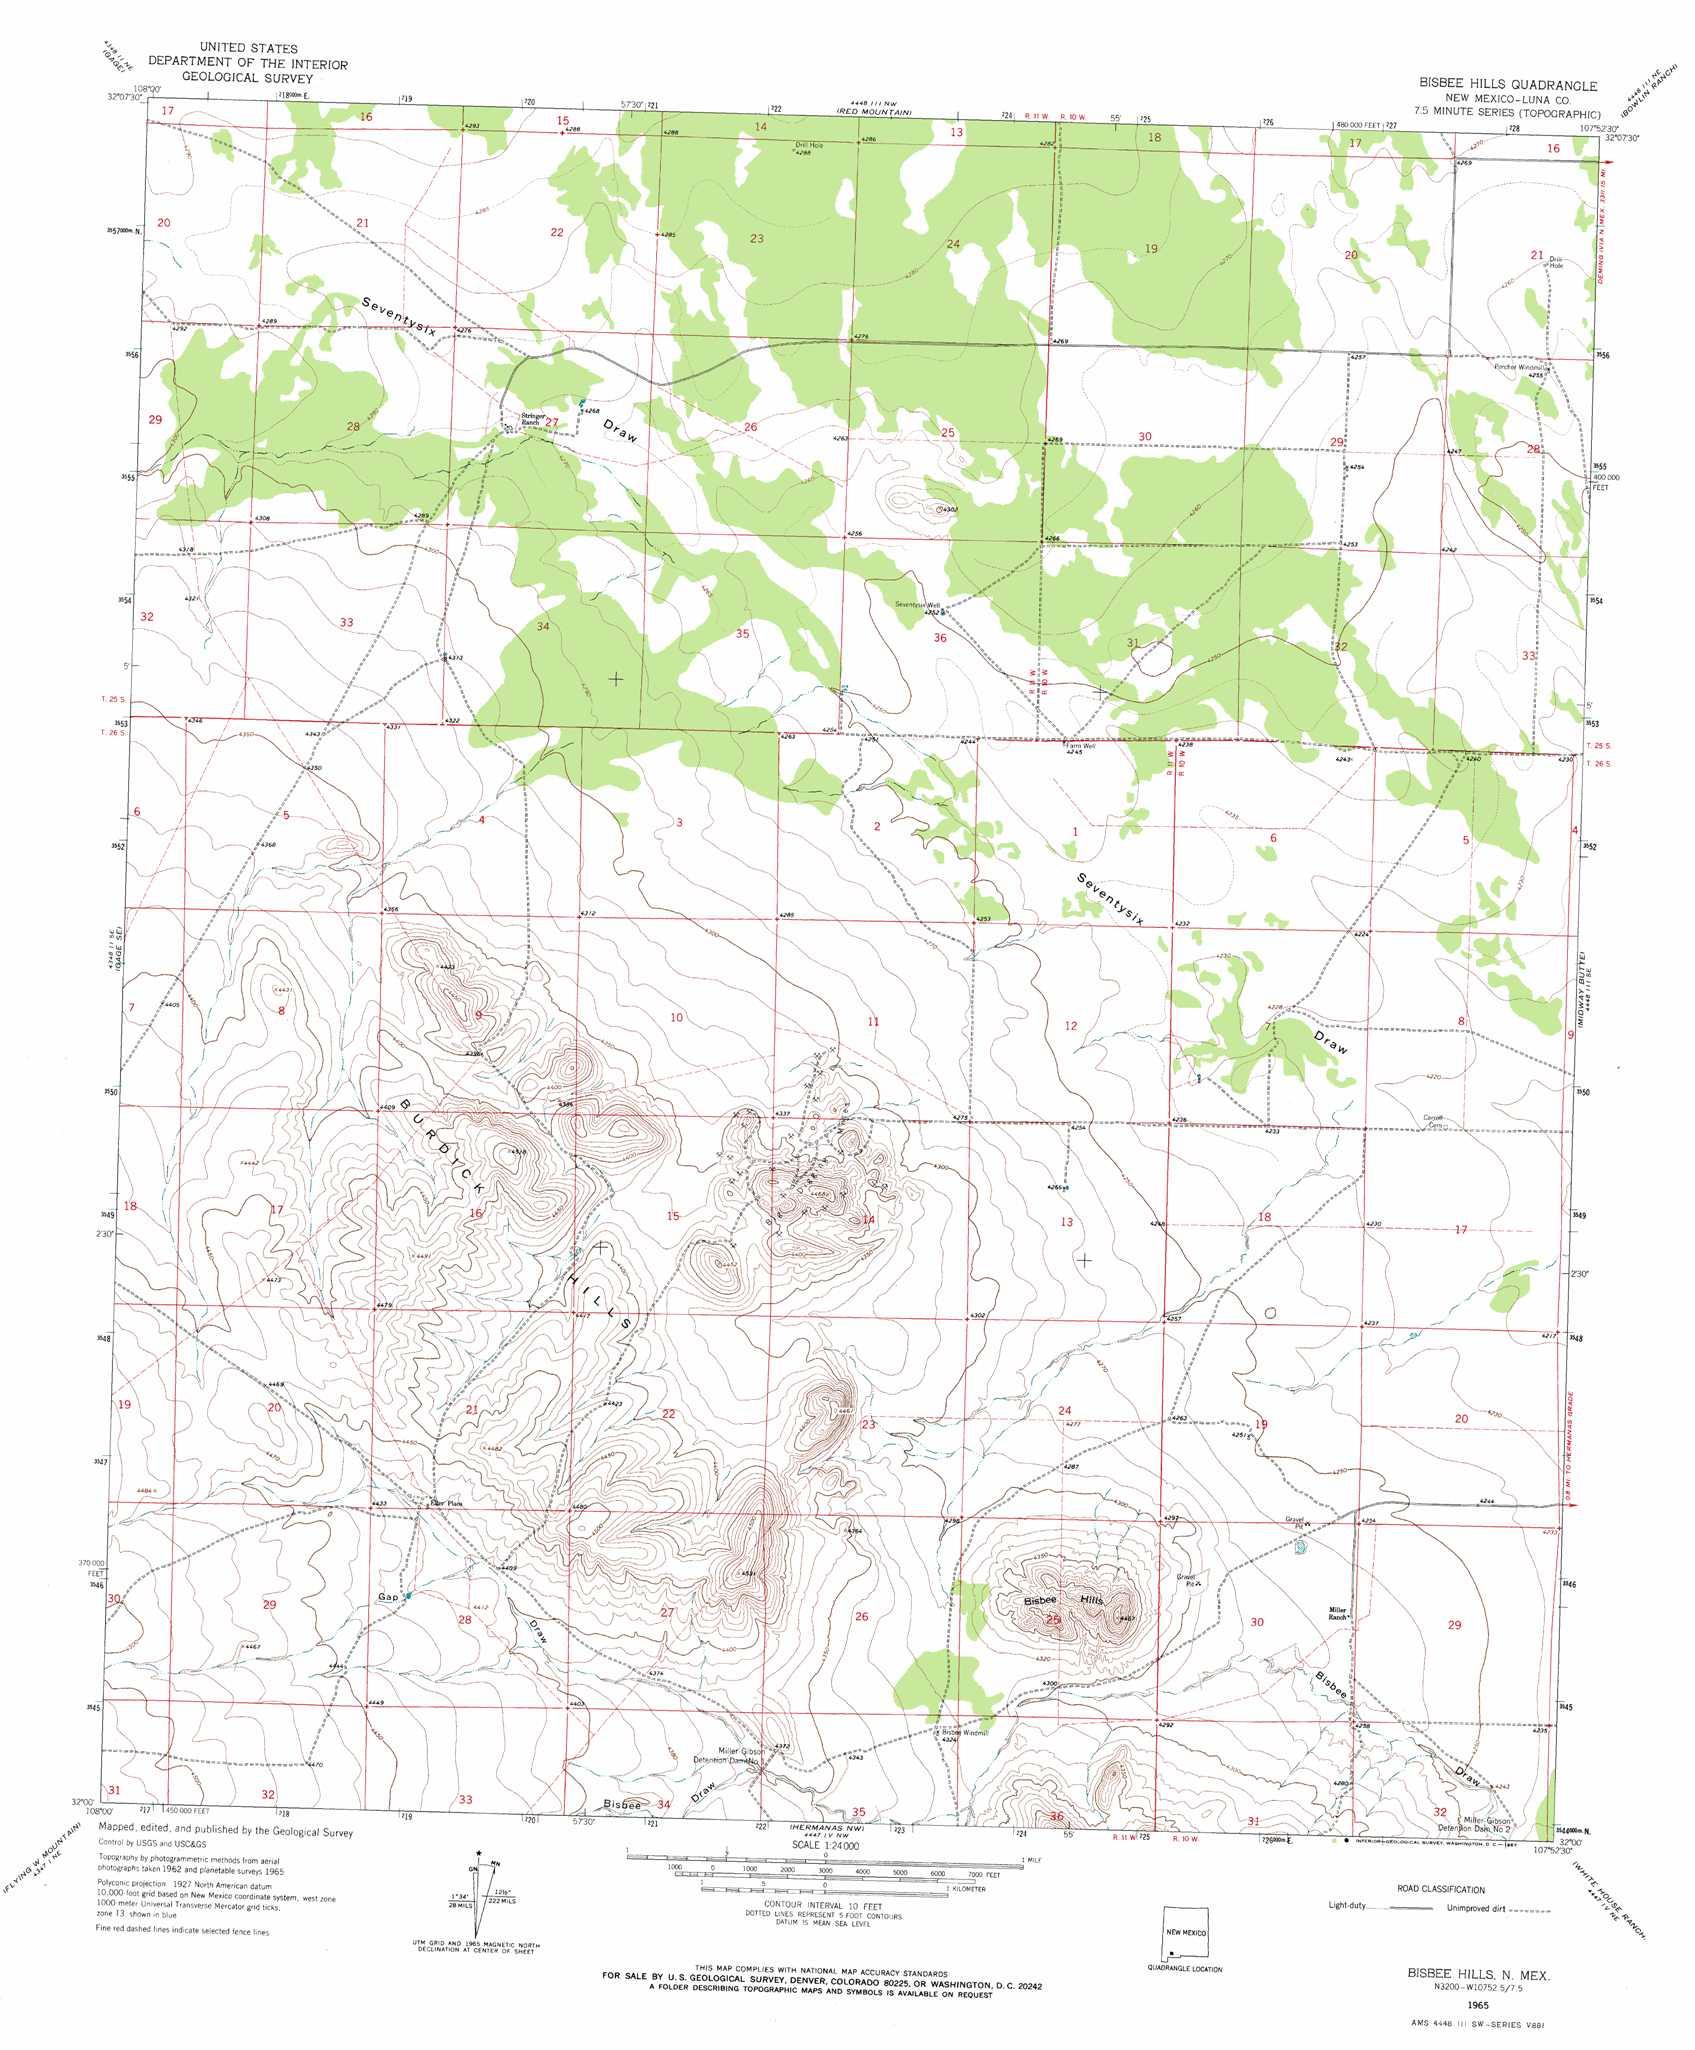 Bisbee hills topographic map nm usgs topo quad 32107a8 bisbee hills buycottarizona Image collections